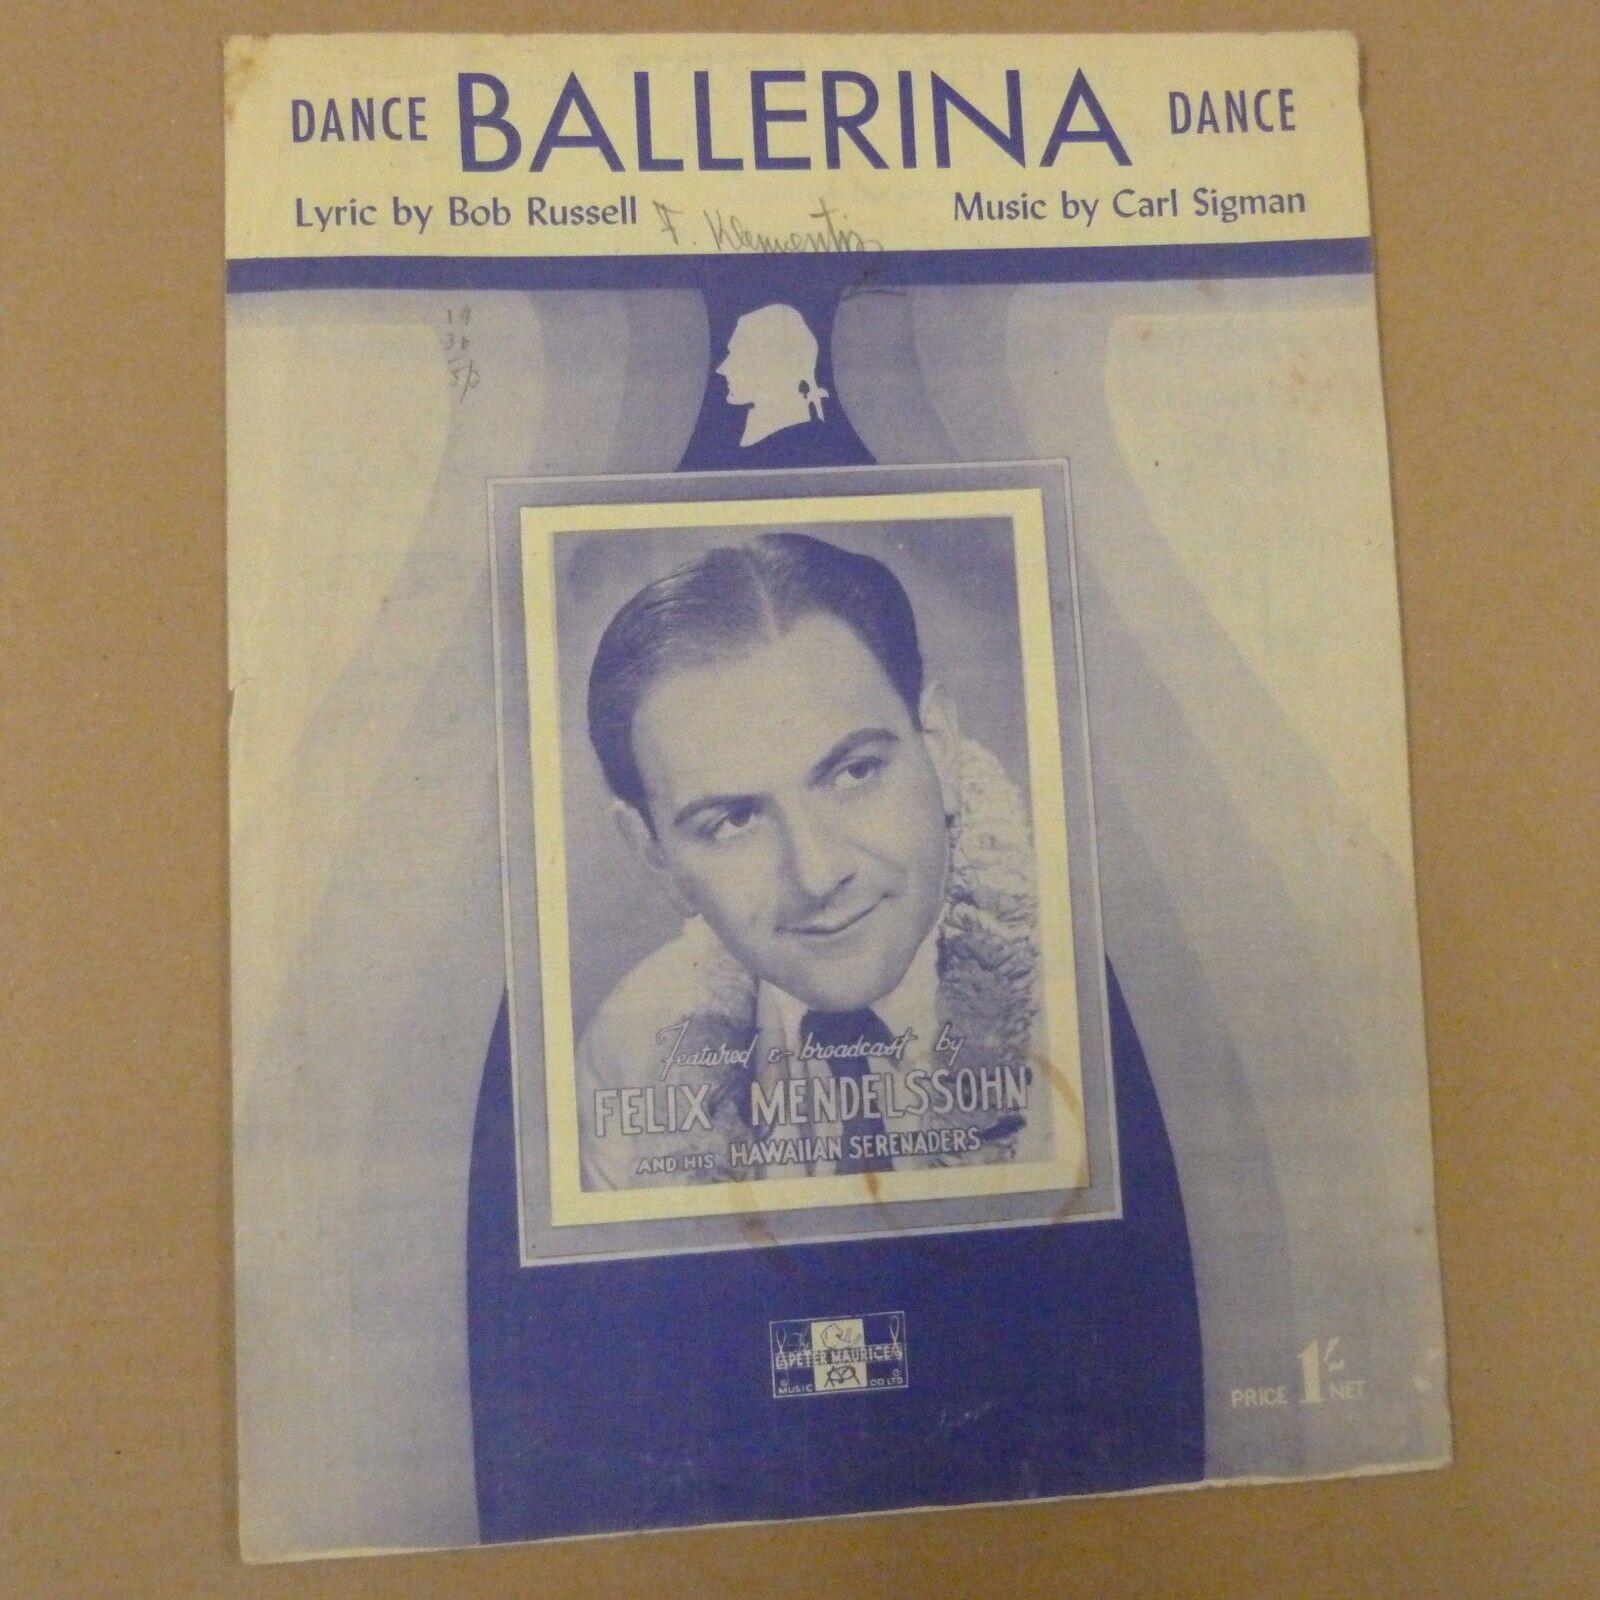 Fond de danse danse ballerine danse de felix mendelssohn 1947 441c72